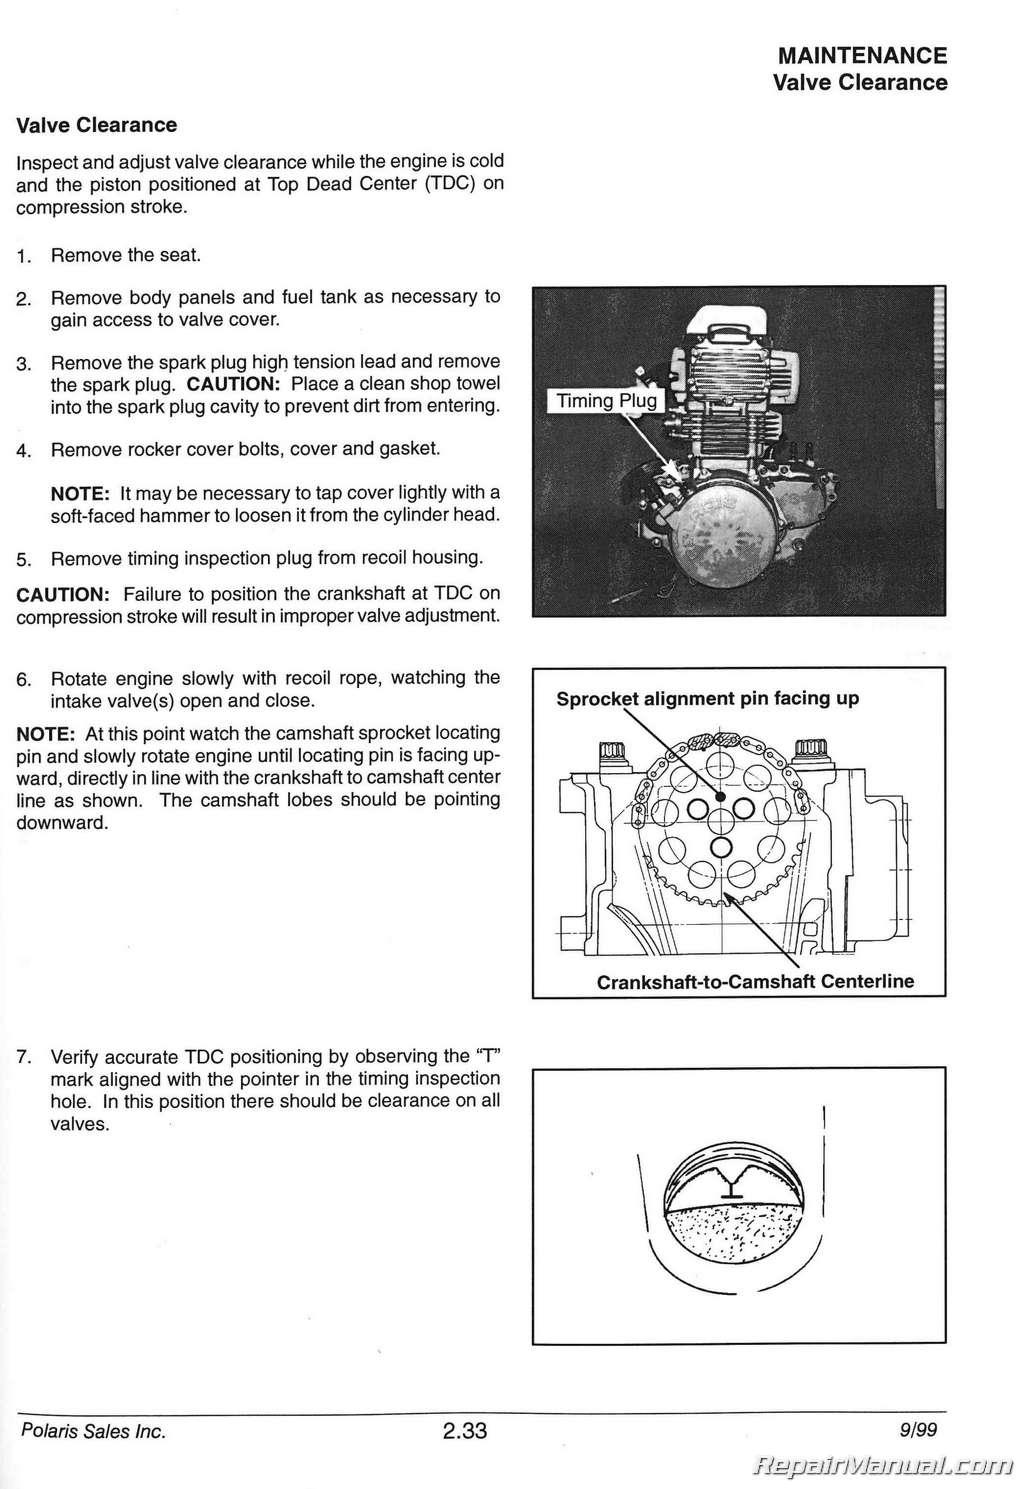 1996 2000 Polaris Sportsman 335 500 ATV Service Manual_Page_1?resize\=800%2C1163\&ssl\=1 96 1998 polaris sportsman 500 parts 2008 polaris ranger parts